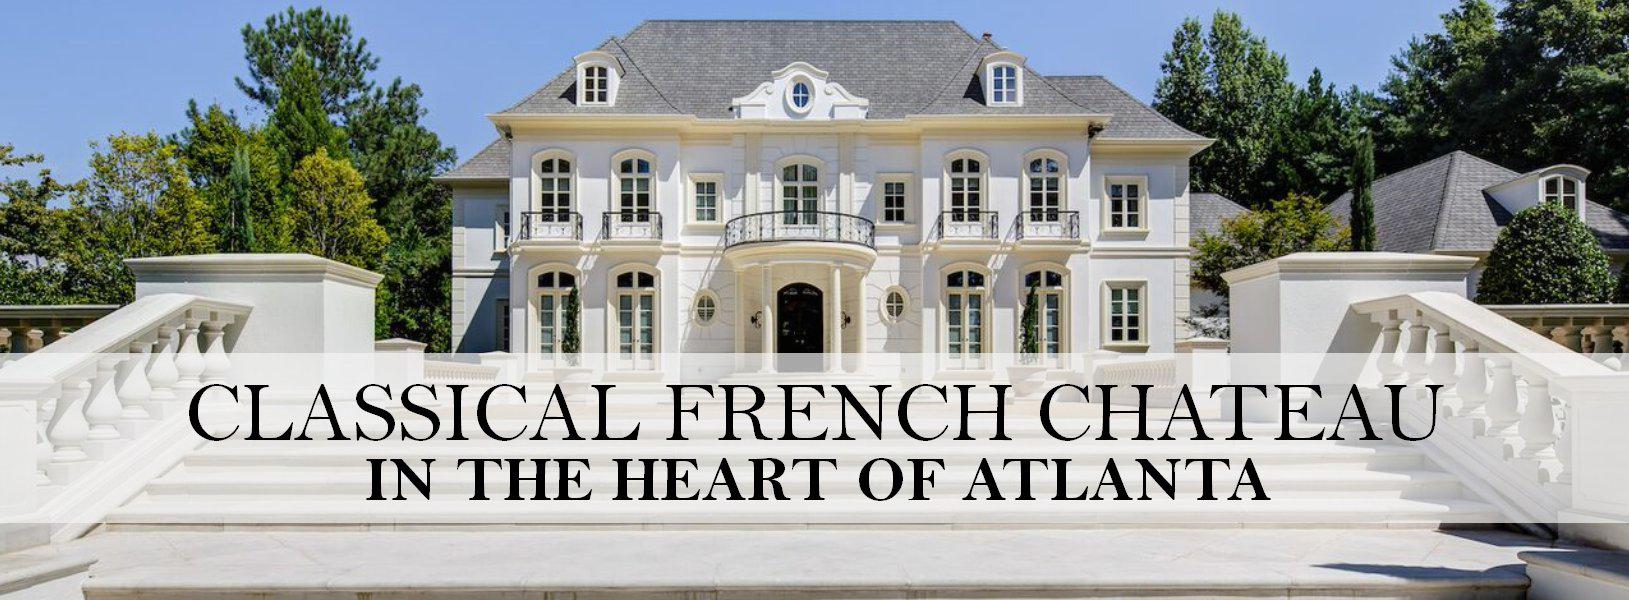 Atlanta auction house house plan 2017 for Luxury house plans atlanta ga